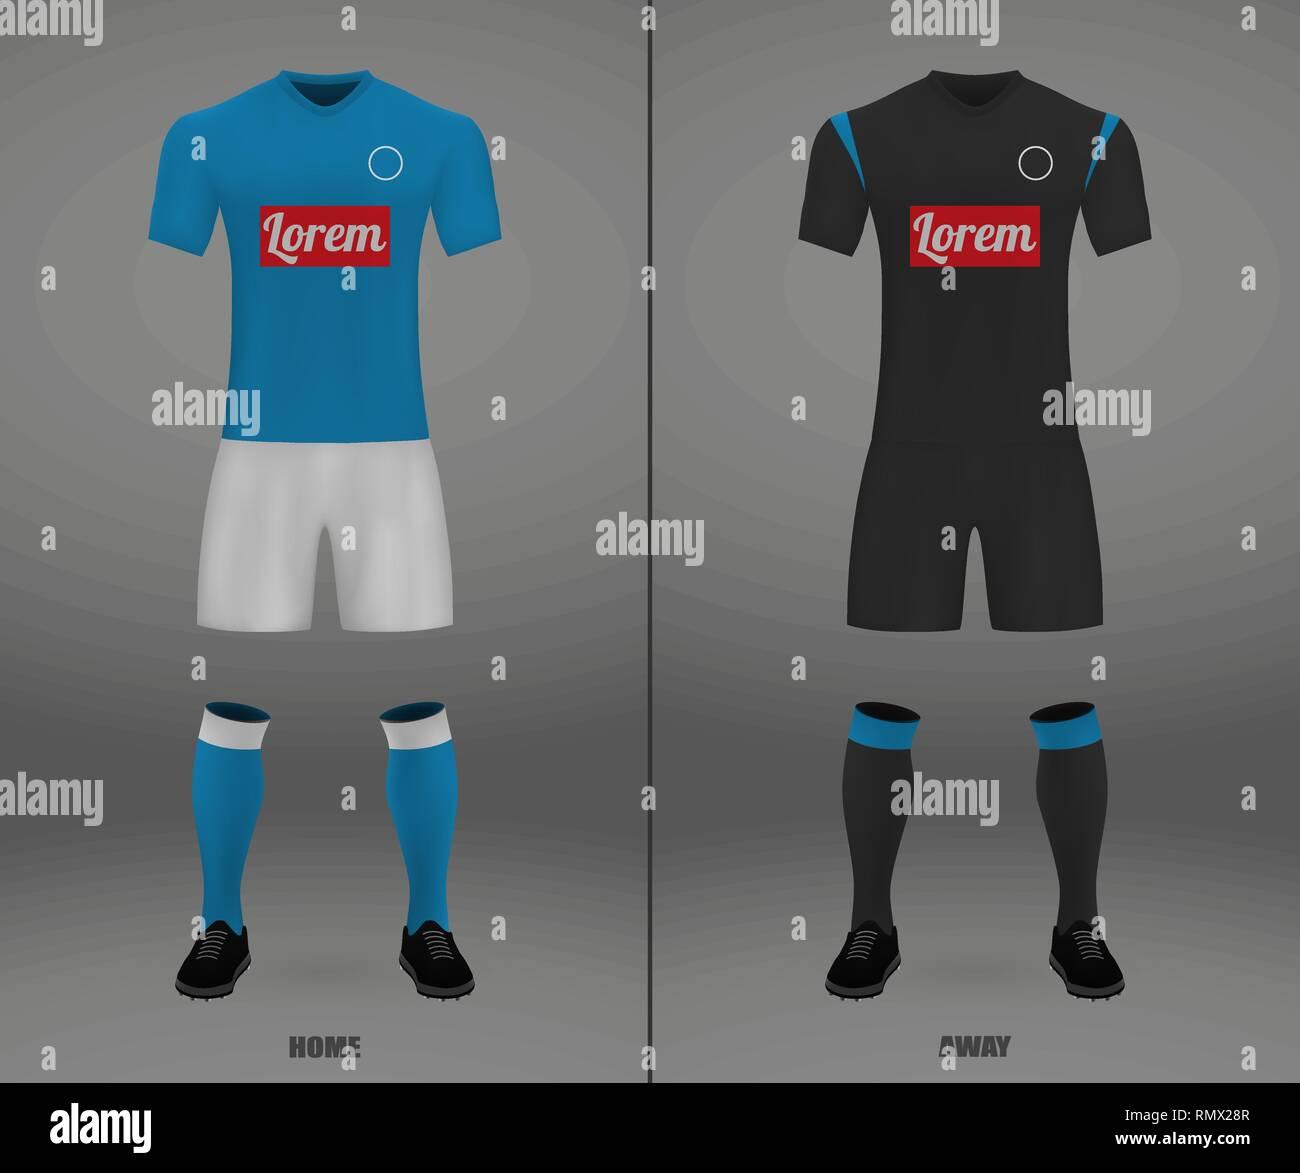 Football Kit Napoli 2018 19 Shirt Template For Soccer Jersey Vector Illustration Stock Vector Image Art Alamy